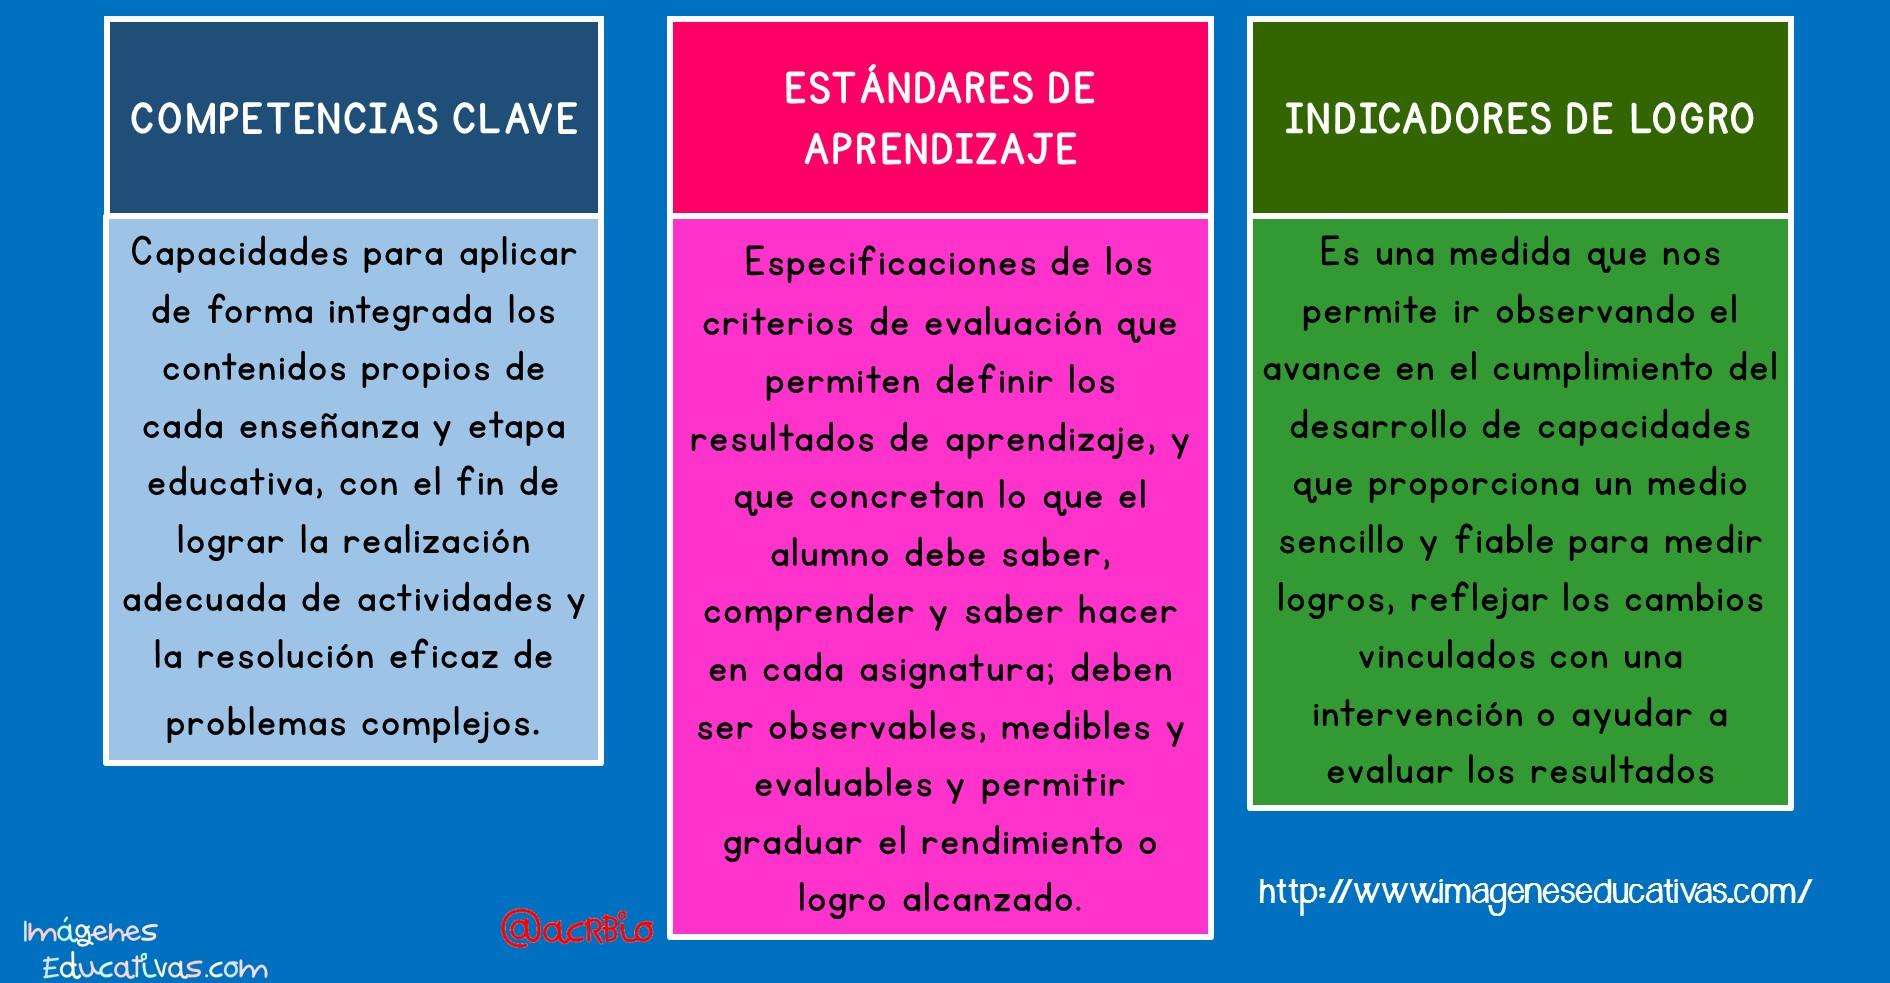 Competencias clave, estándares de aprendizaje e indicadores de logro ...